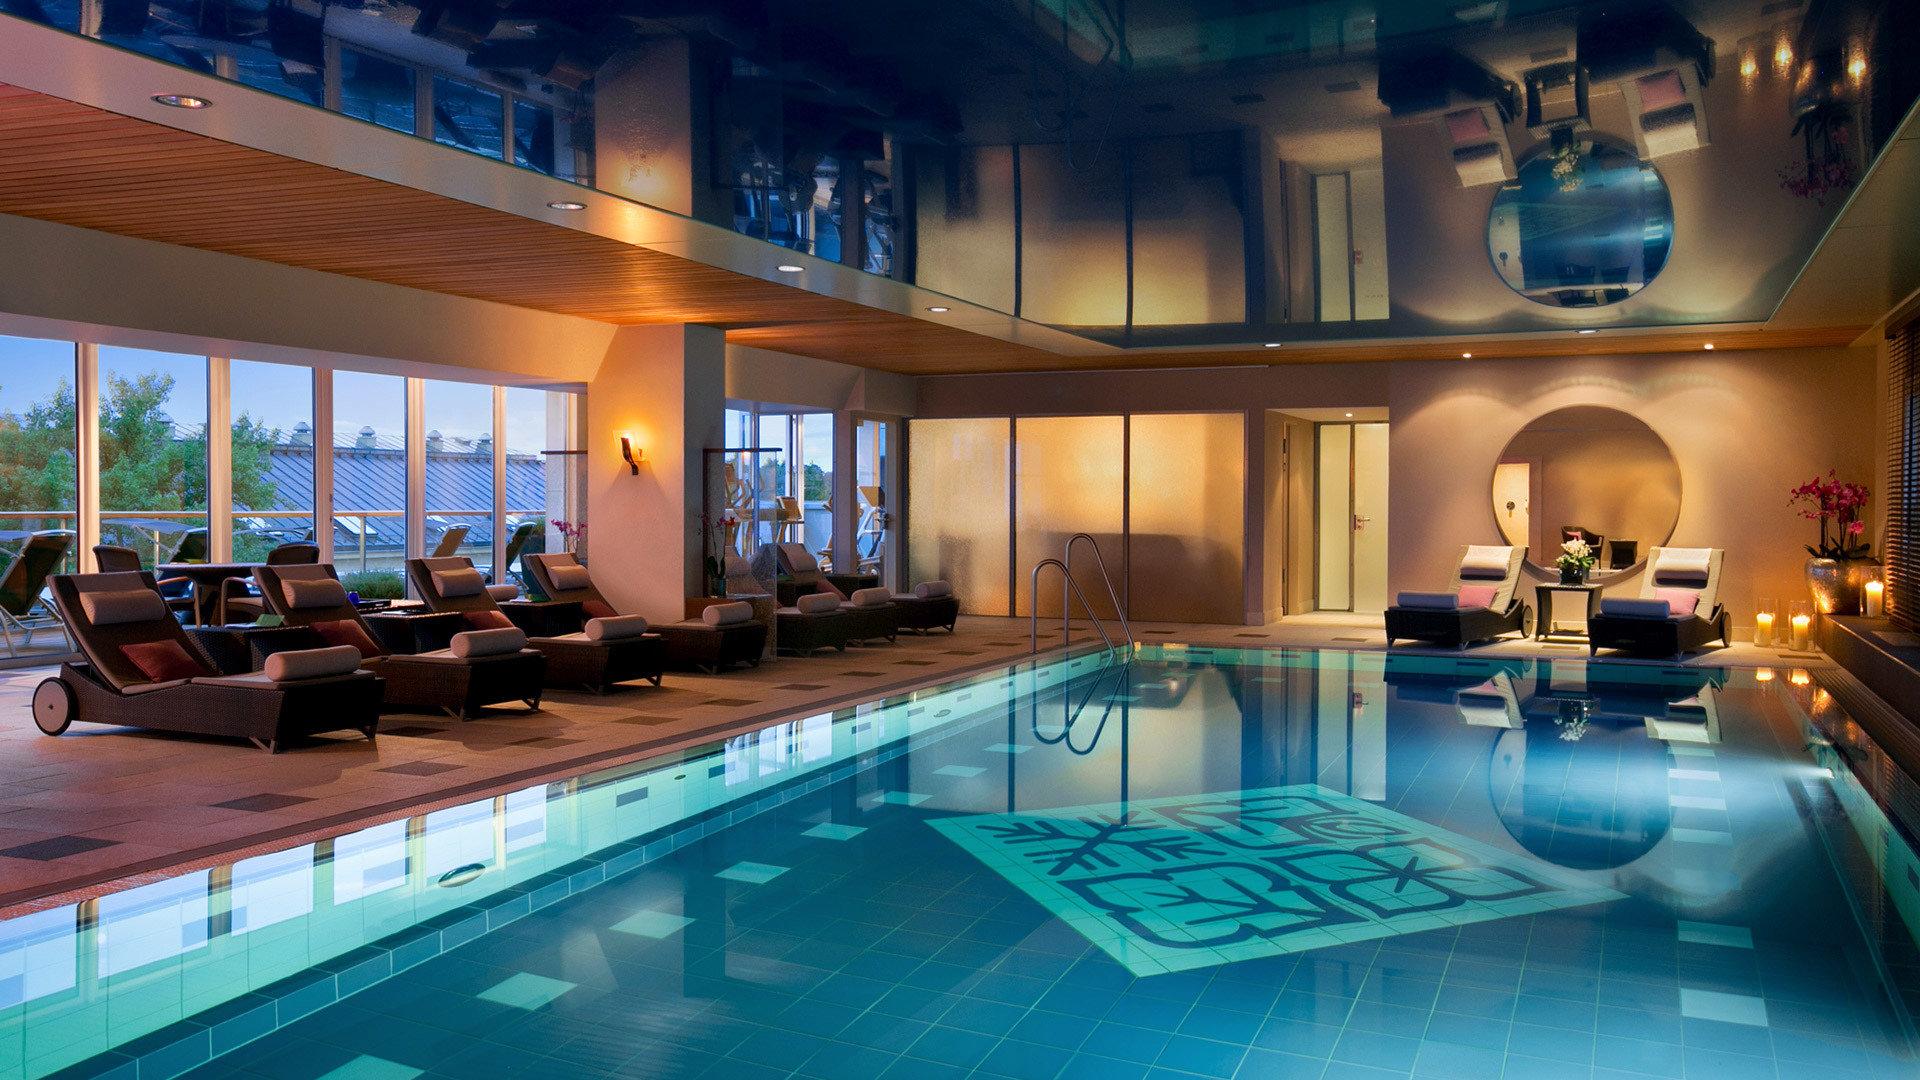 swimming pool property leisure Resort billiard room mansion blue